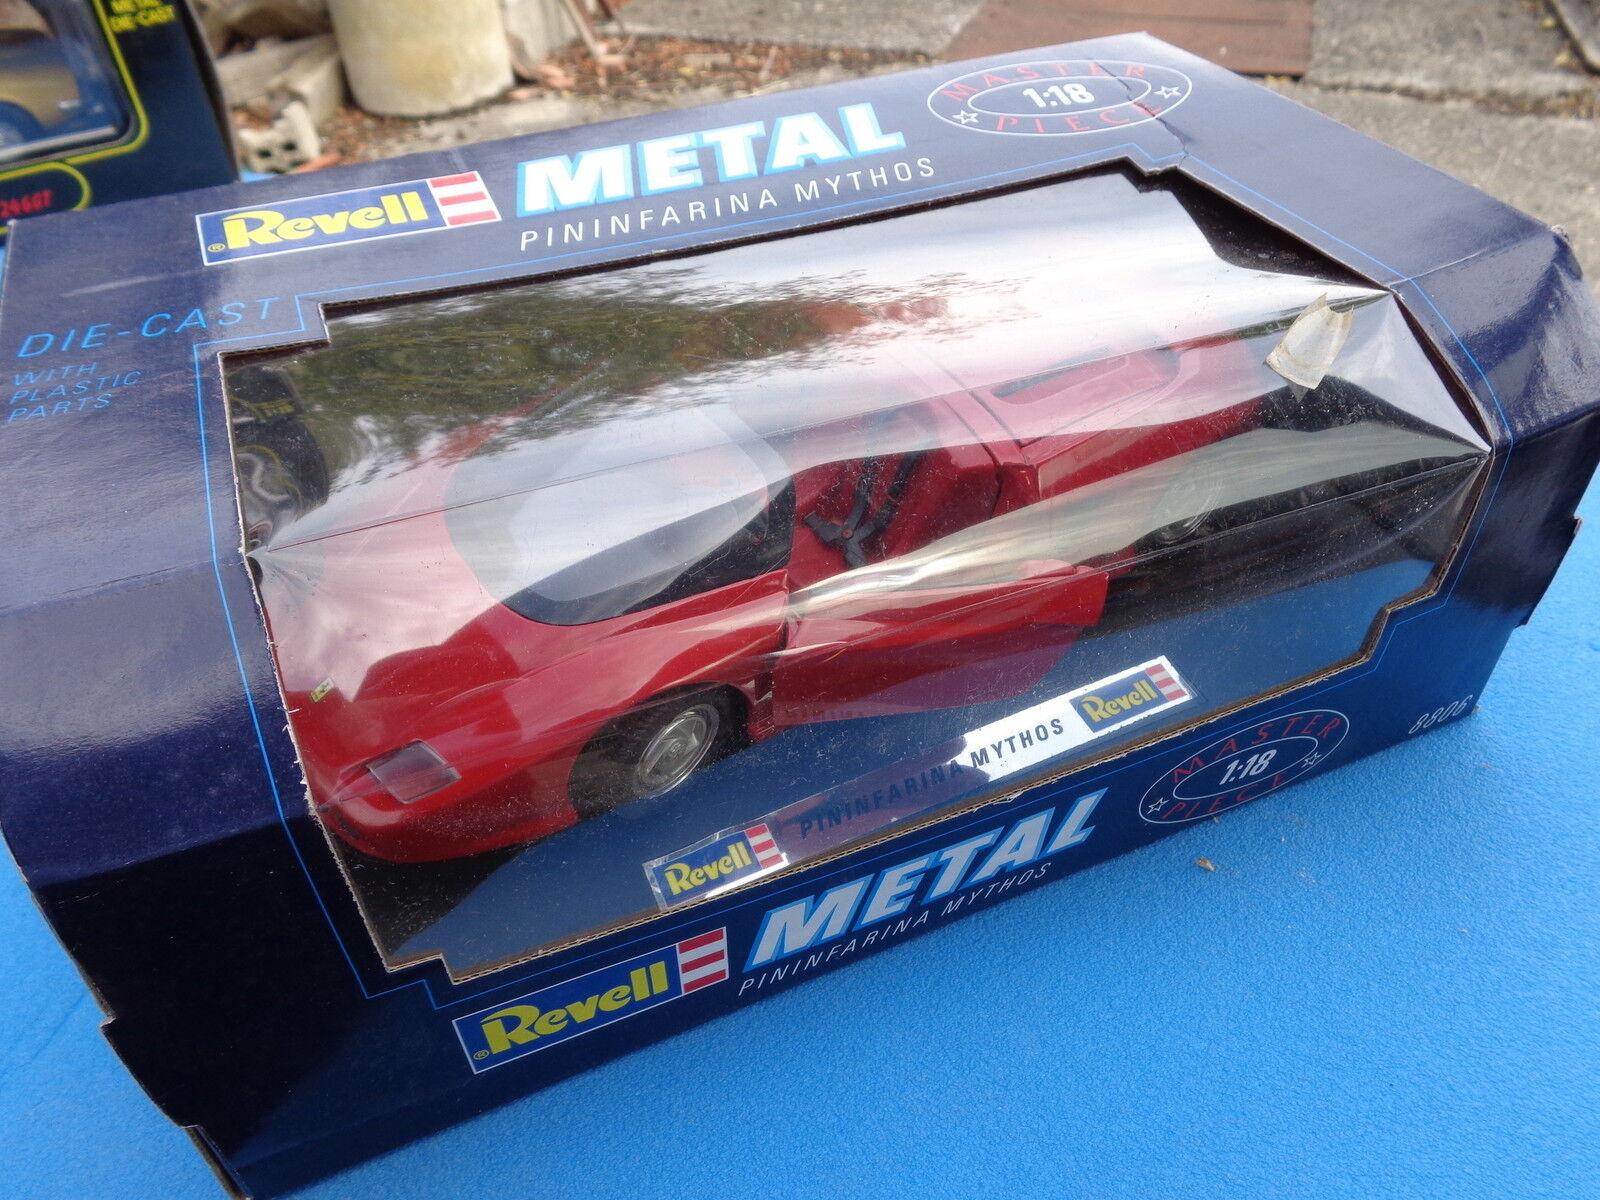 Revell 1 18 1984 Réf. 8806  Rare  Pininfarina Mythos Cabriolet Rouge